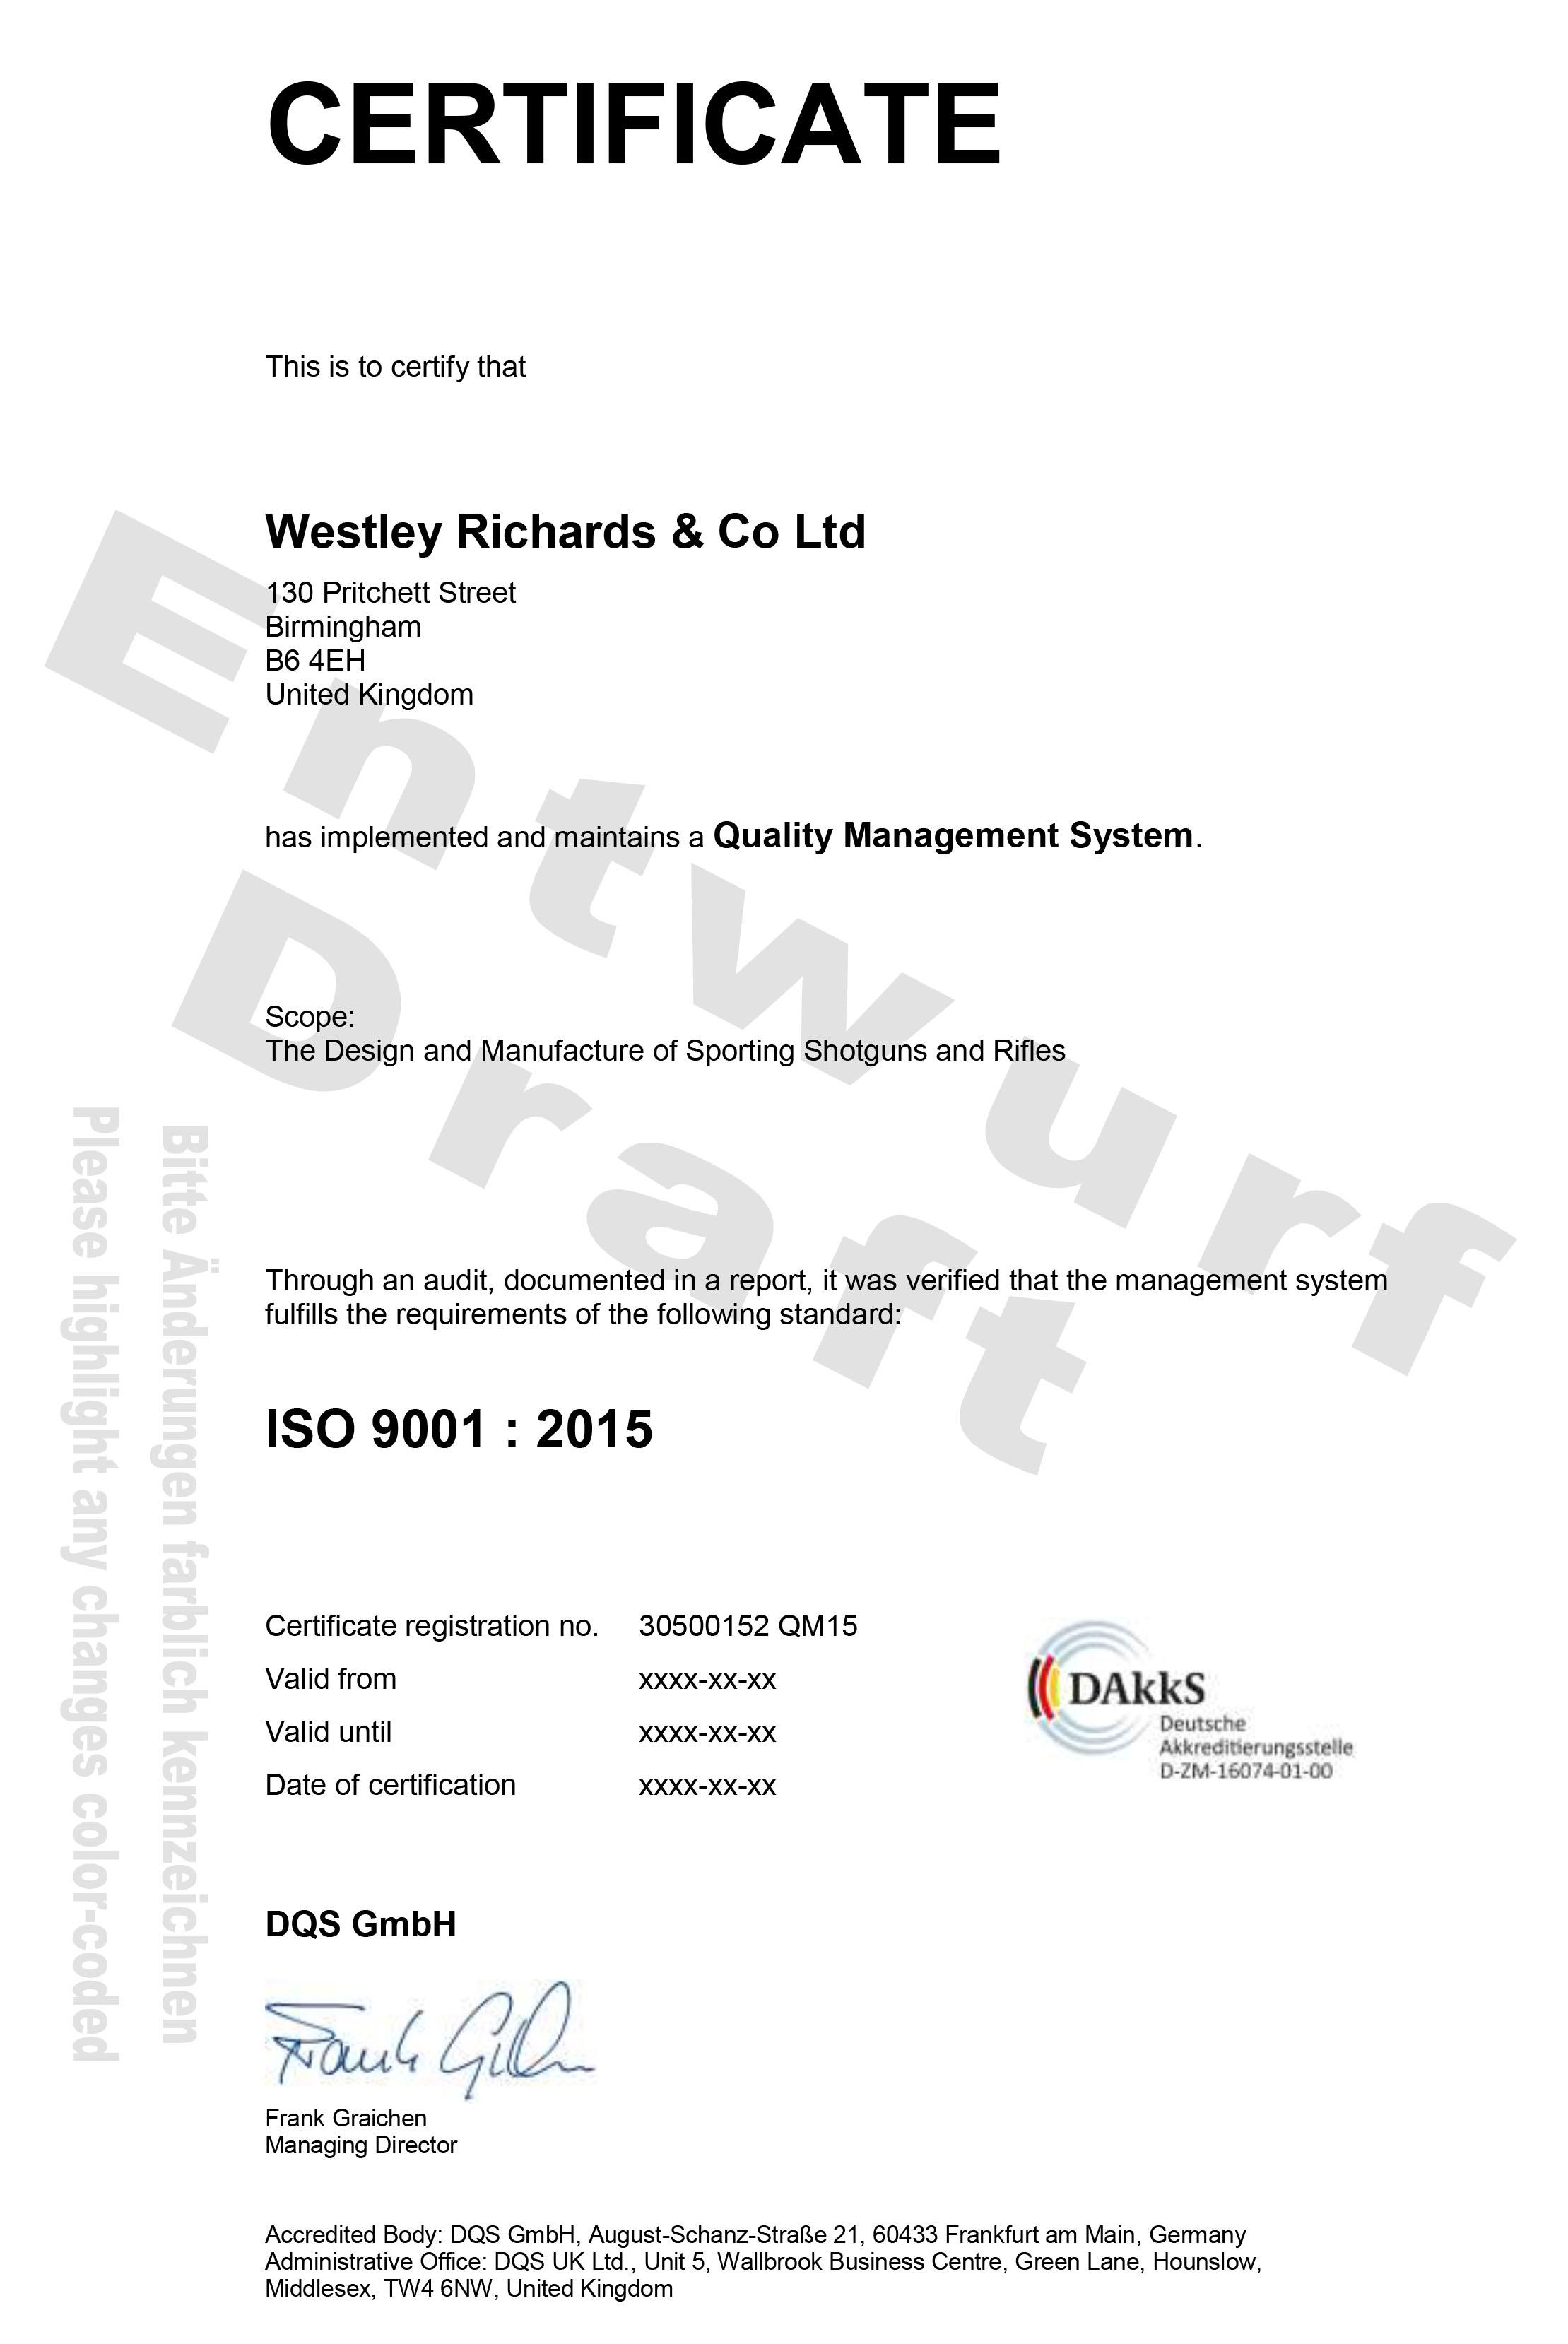 Westley Richards draft ISO 9001:2015